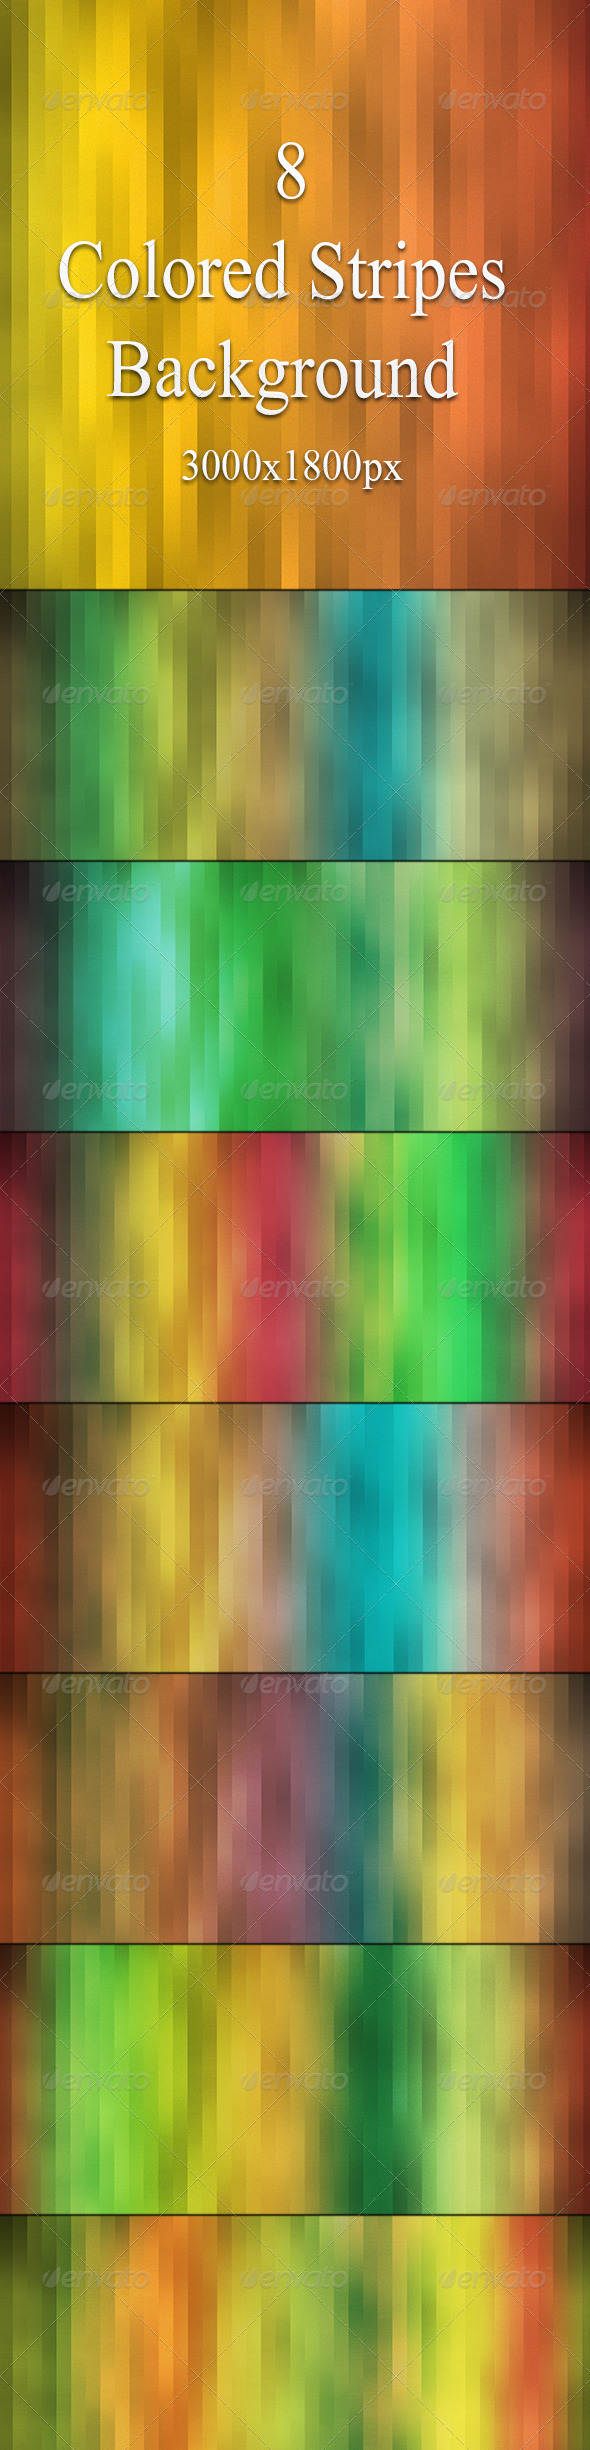 GraphicRiver Colored Stripes Background 6961630